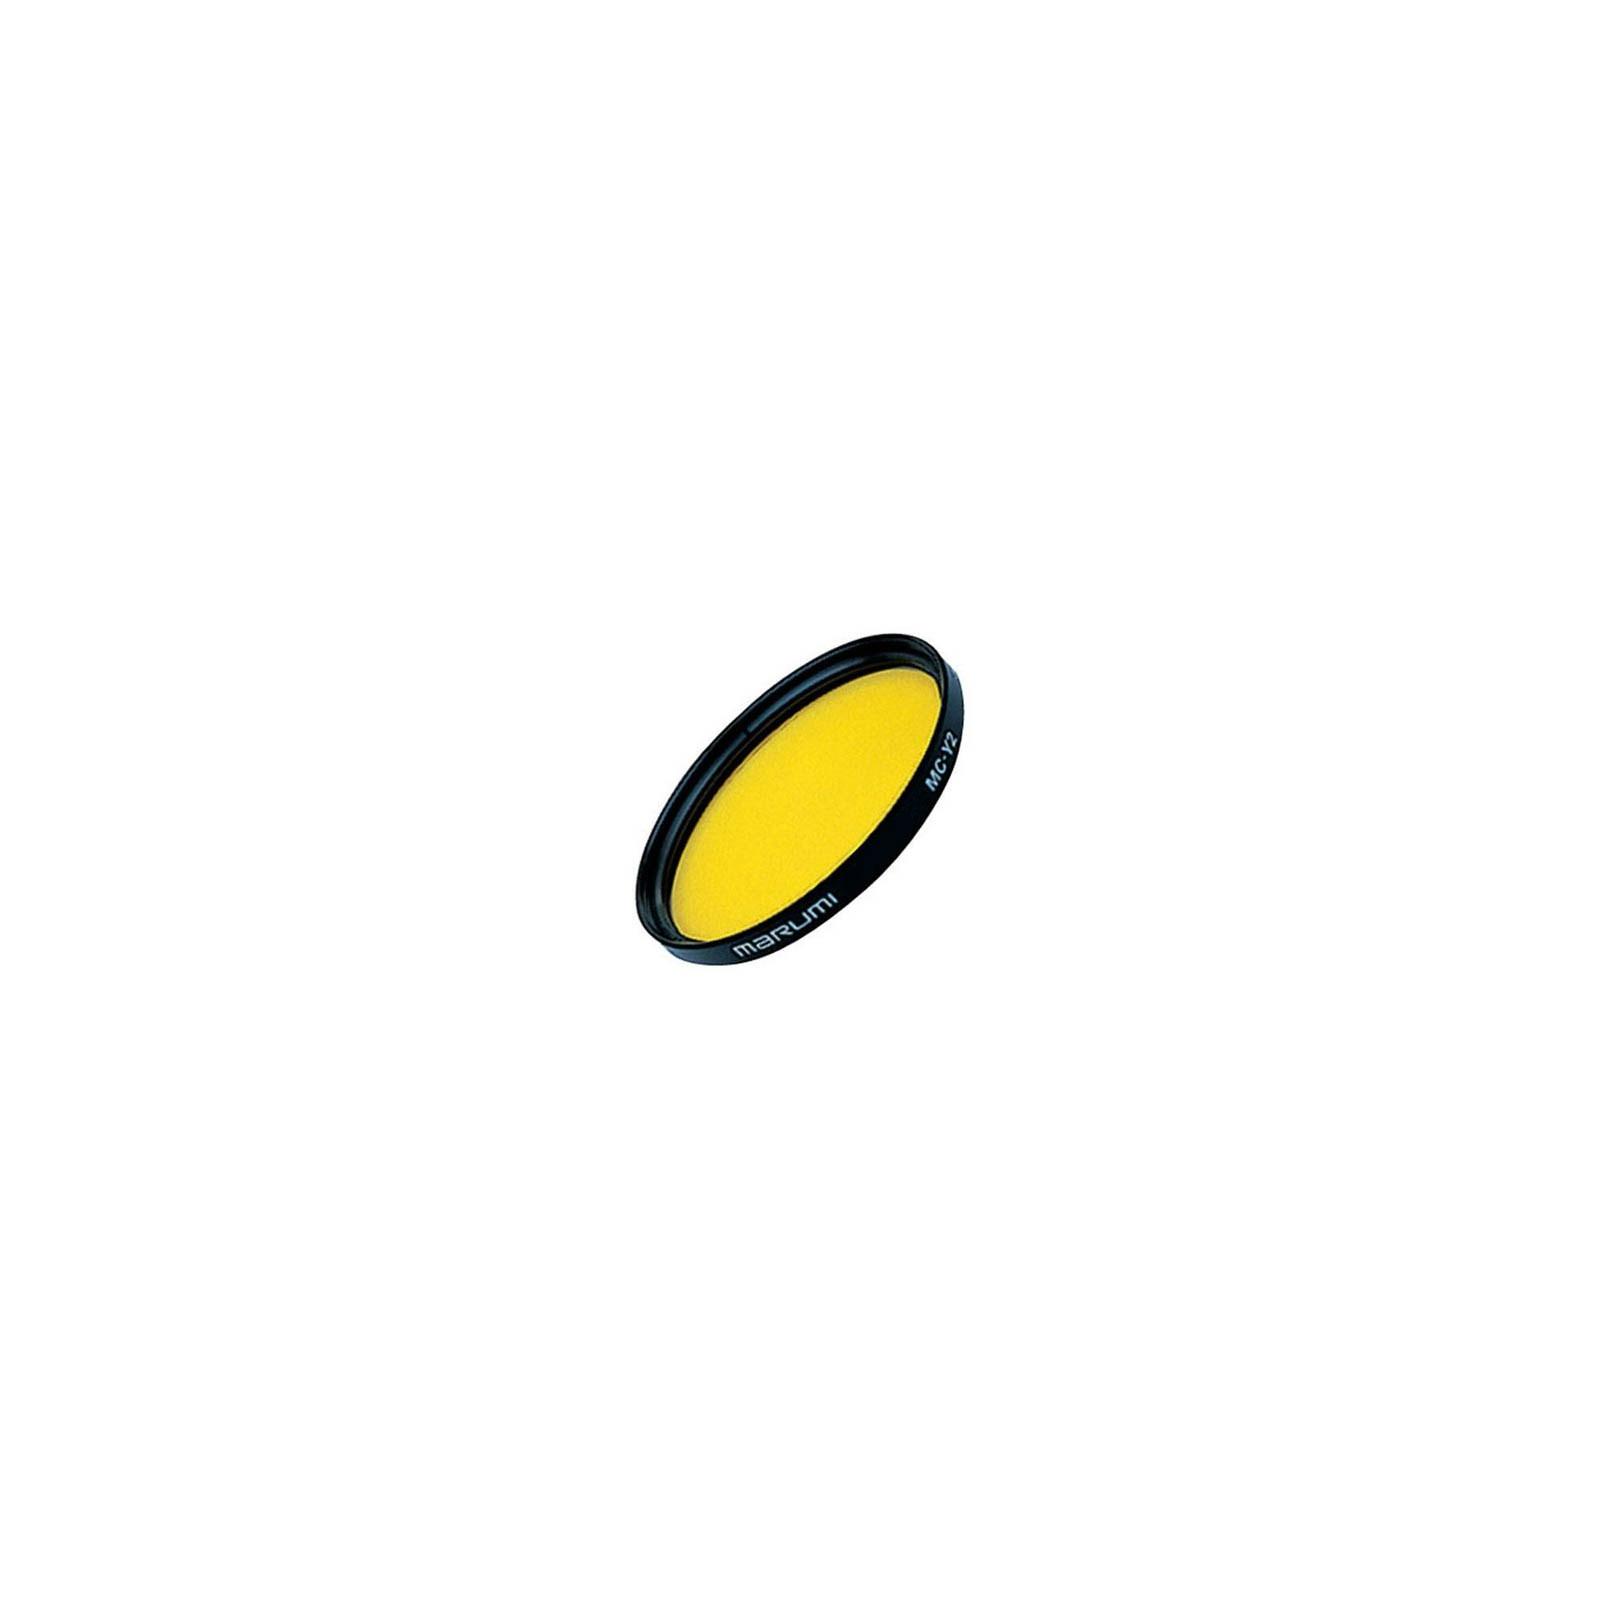 Светофильтр Marumi Y2 (yellow) 49mm